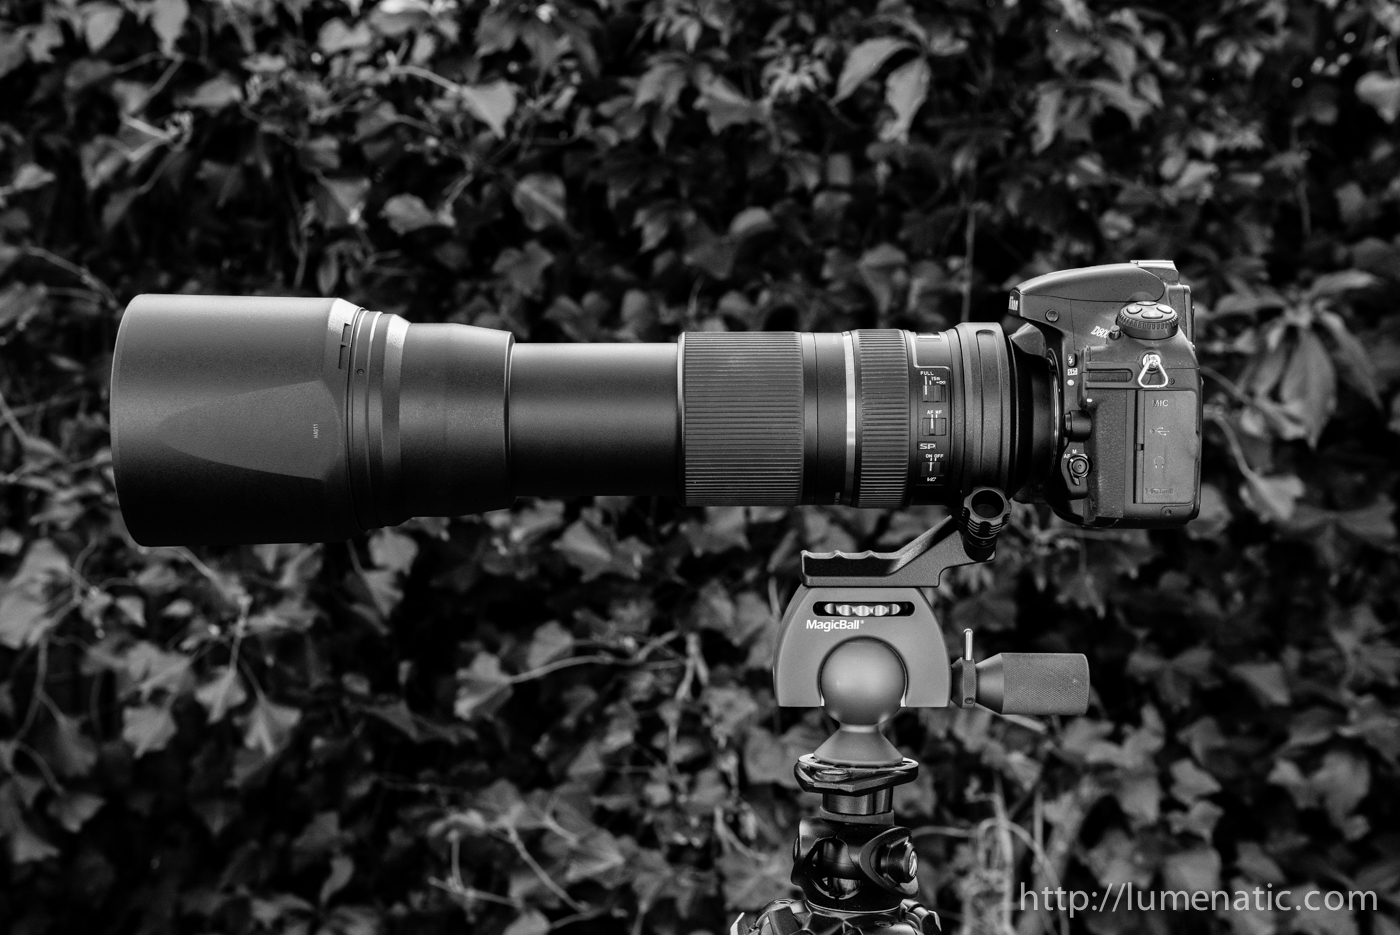 The Tamron 150-600 mm telezoom lens